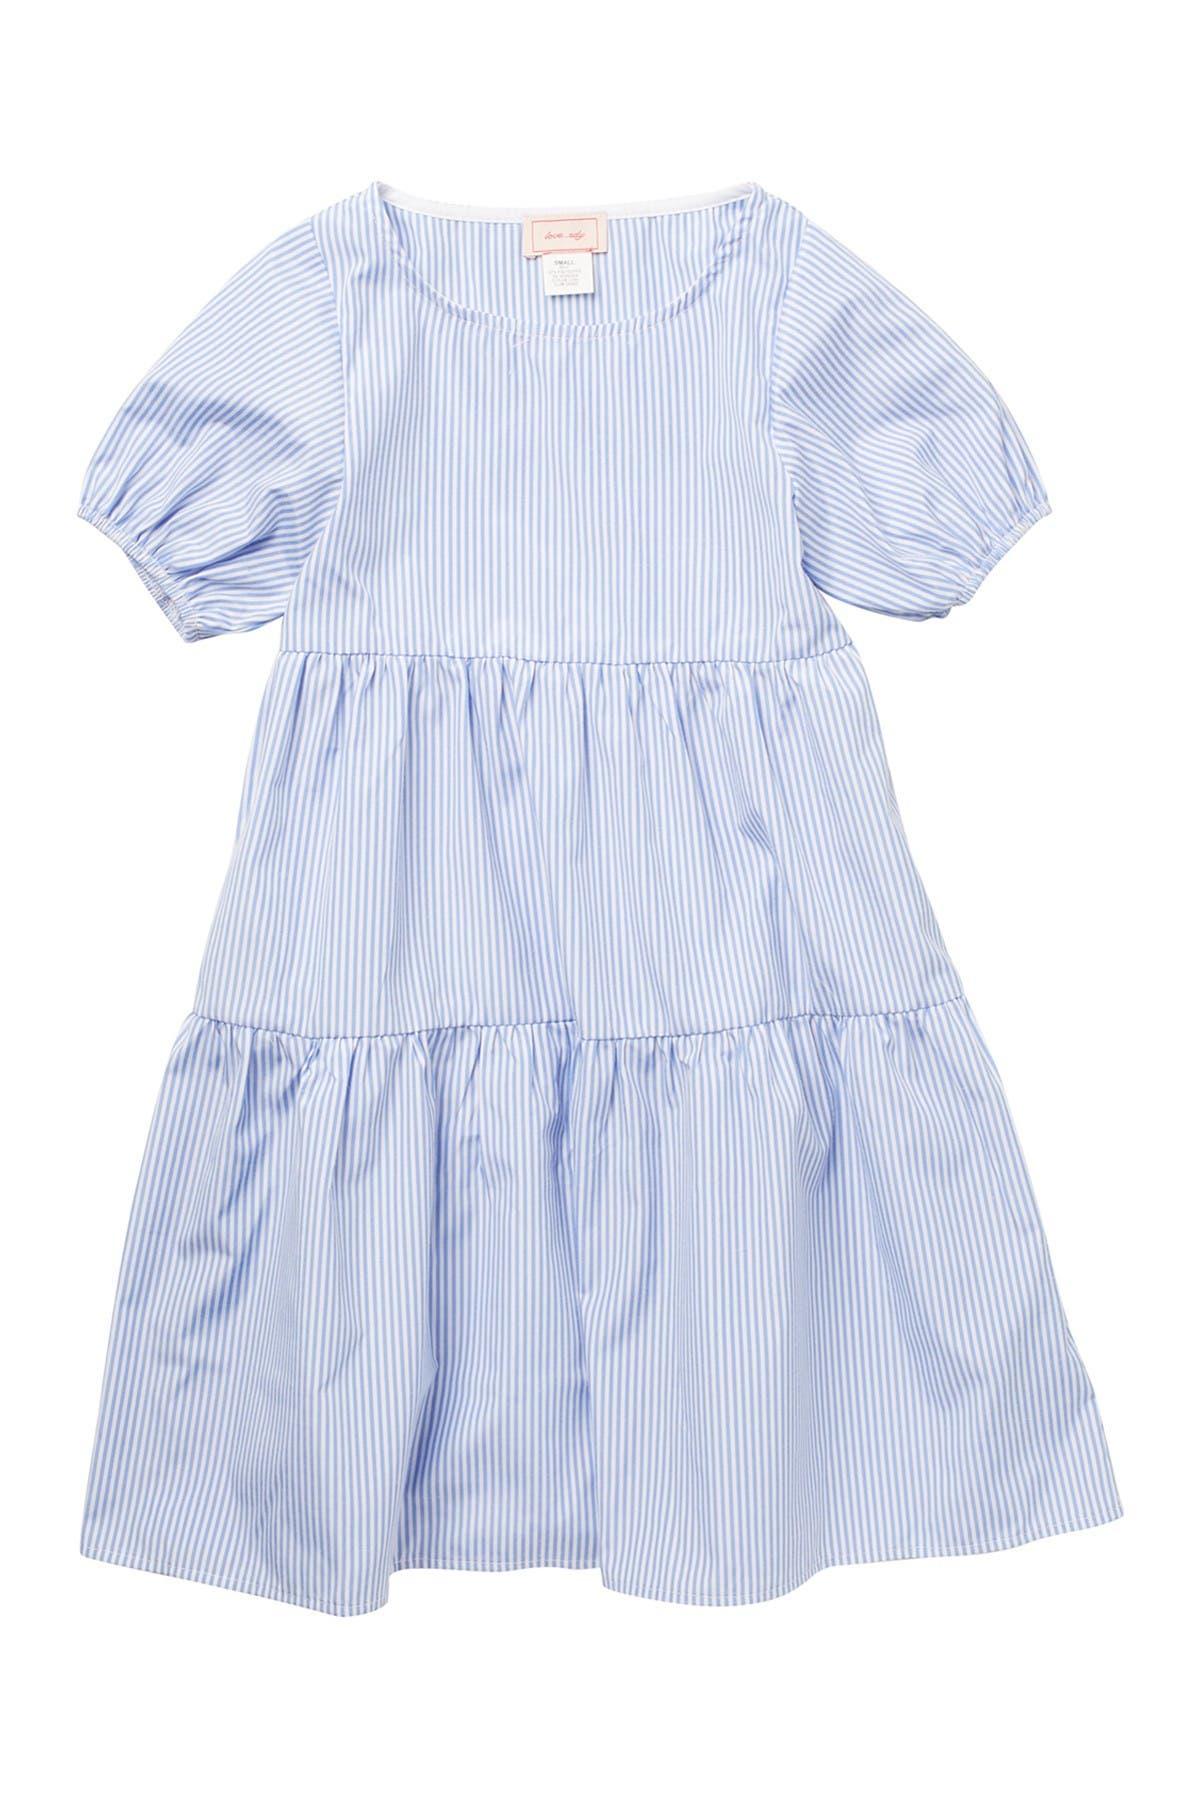 Image of Love...Ady Poplin Baby Doll Dress